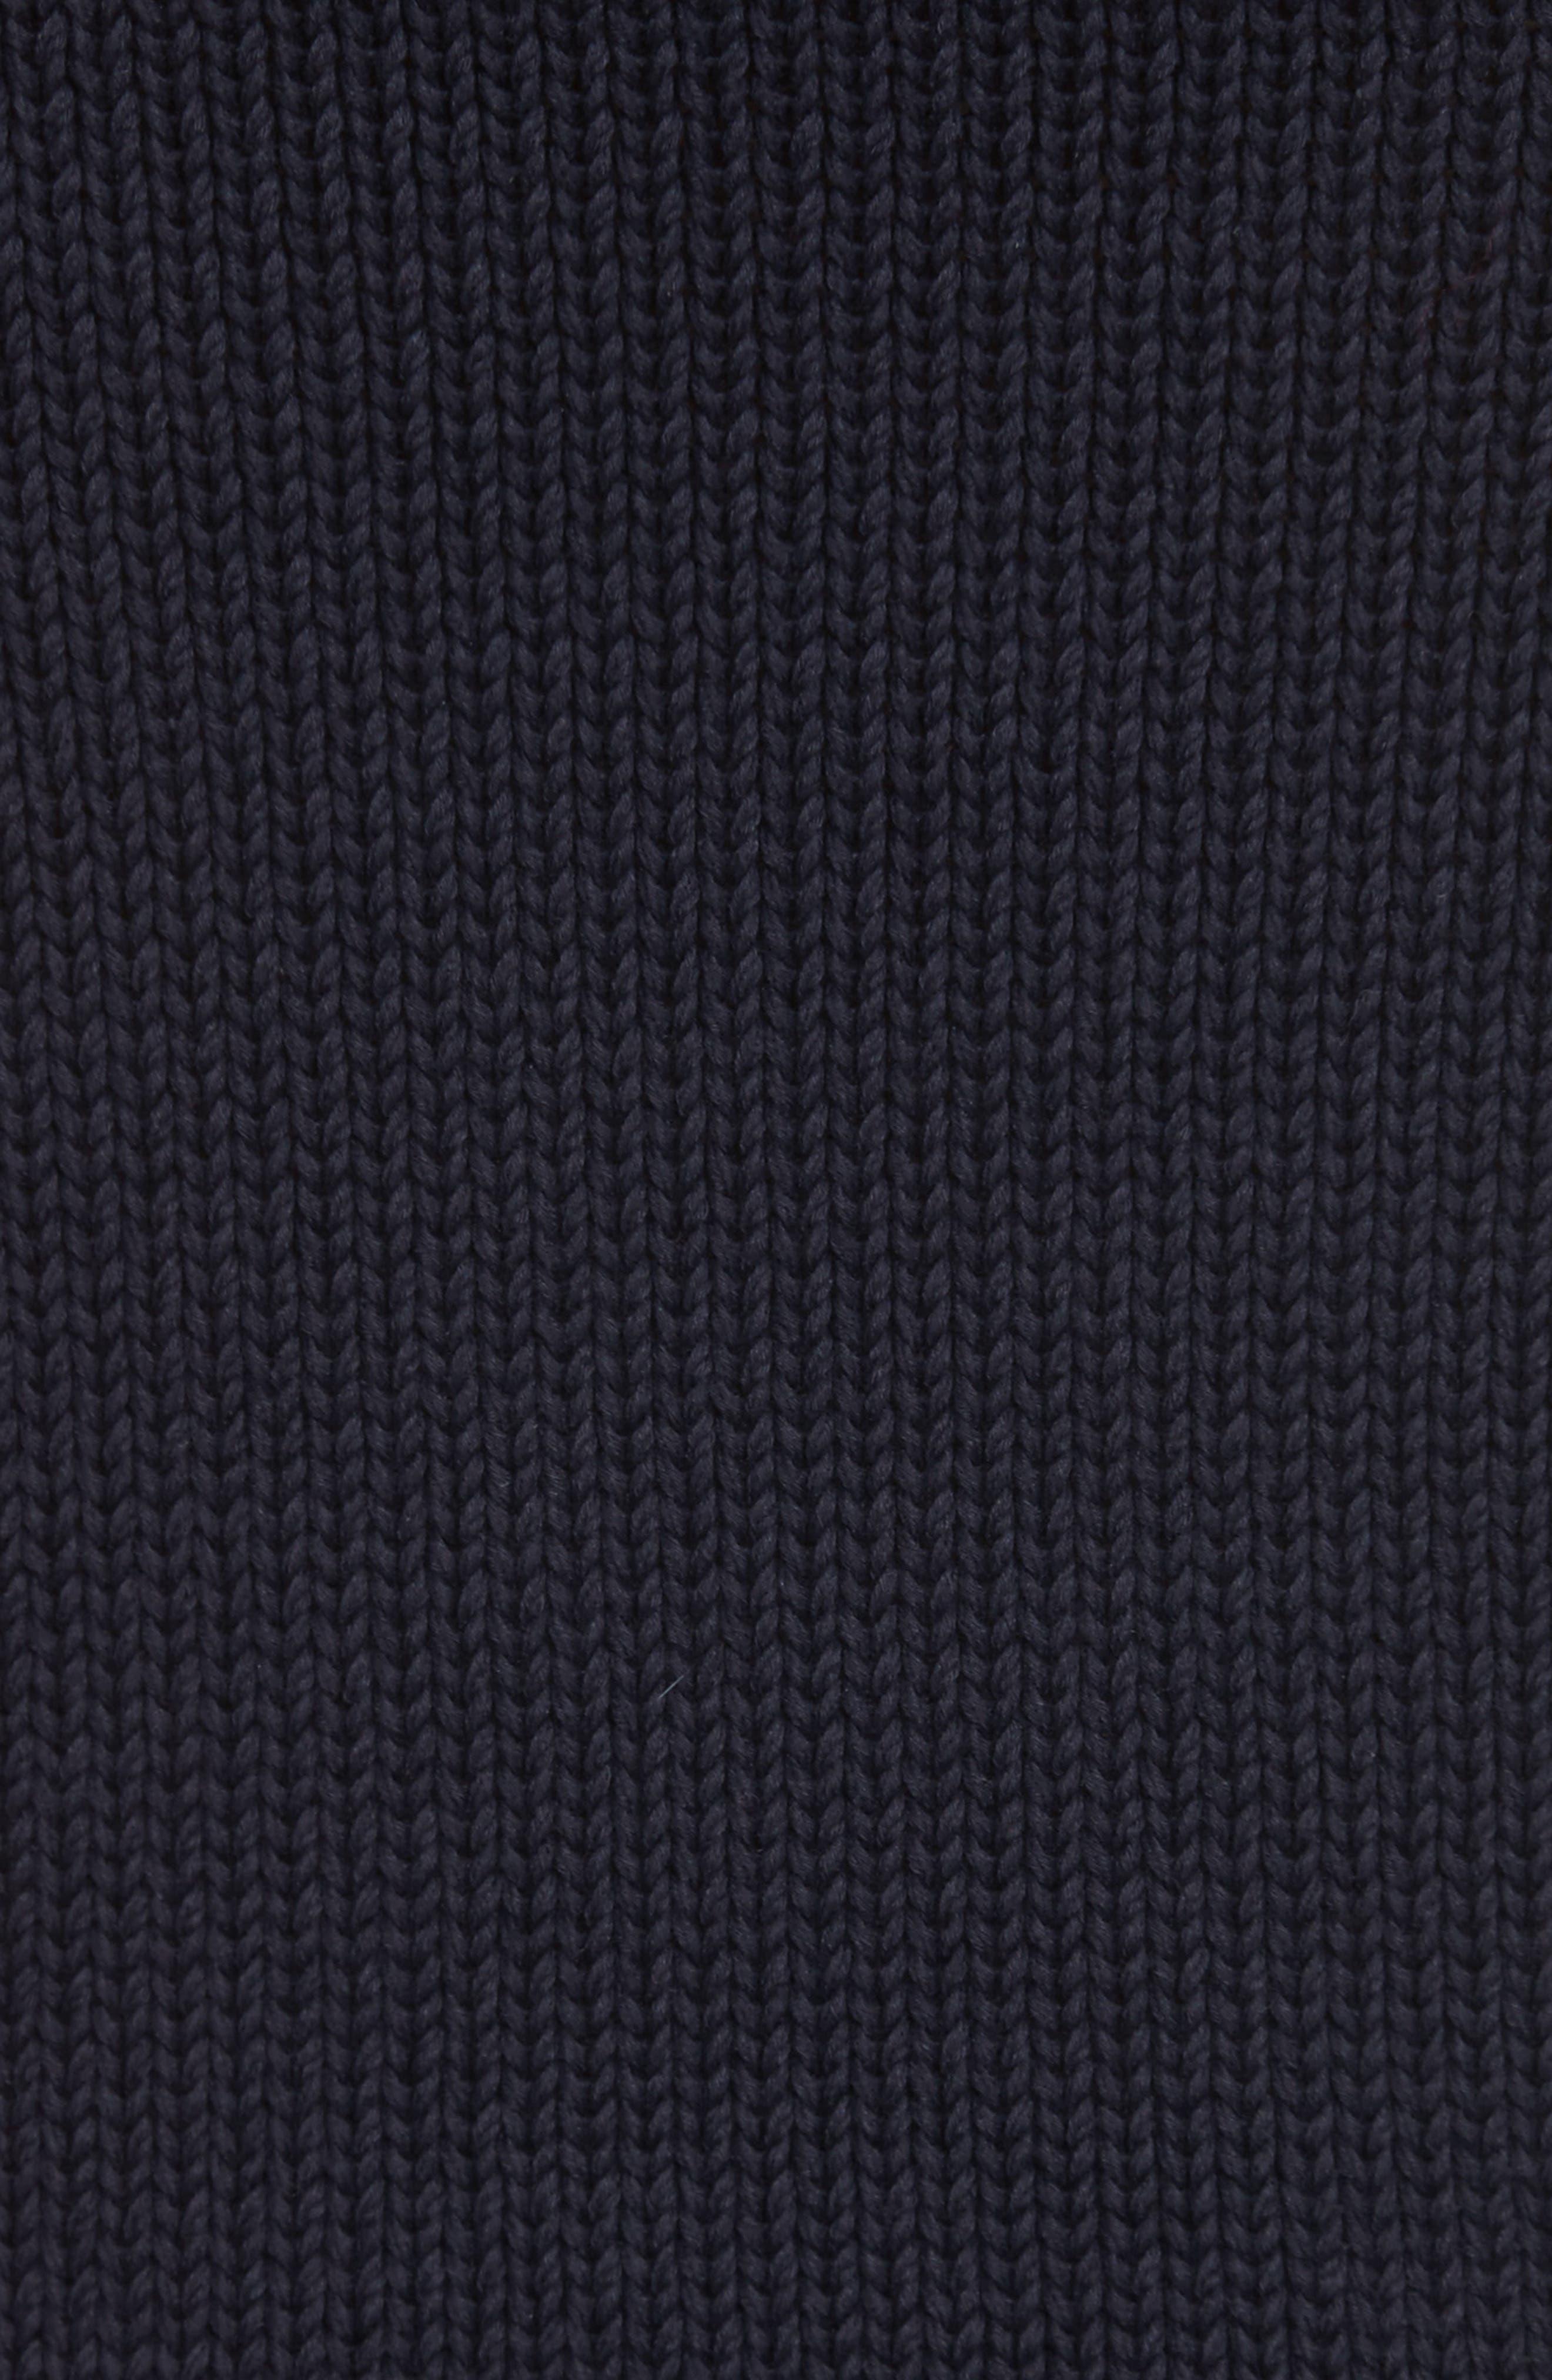 Varsity Upside Down Sweater,                             Alternate thumbnail 5, color,                             005